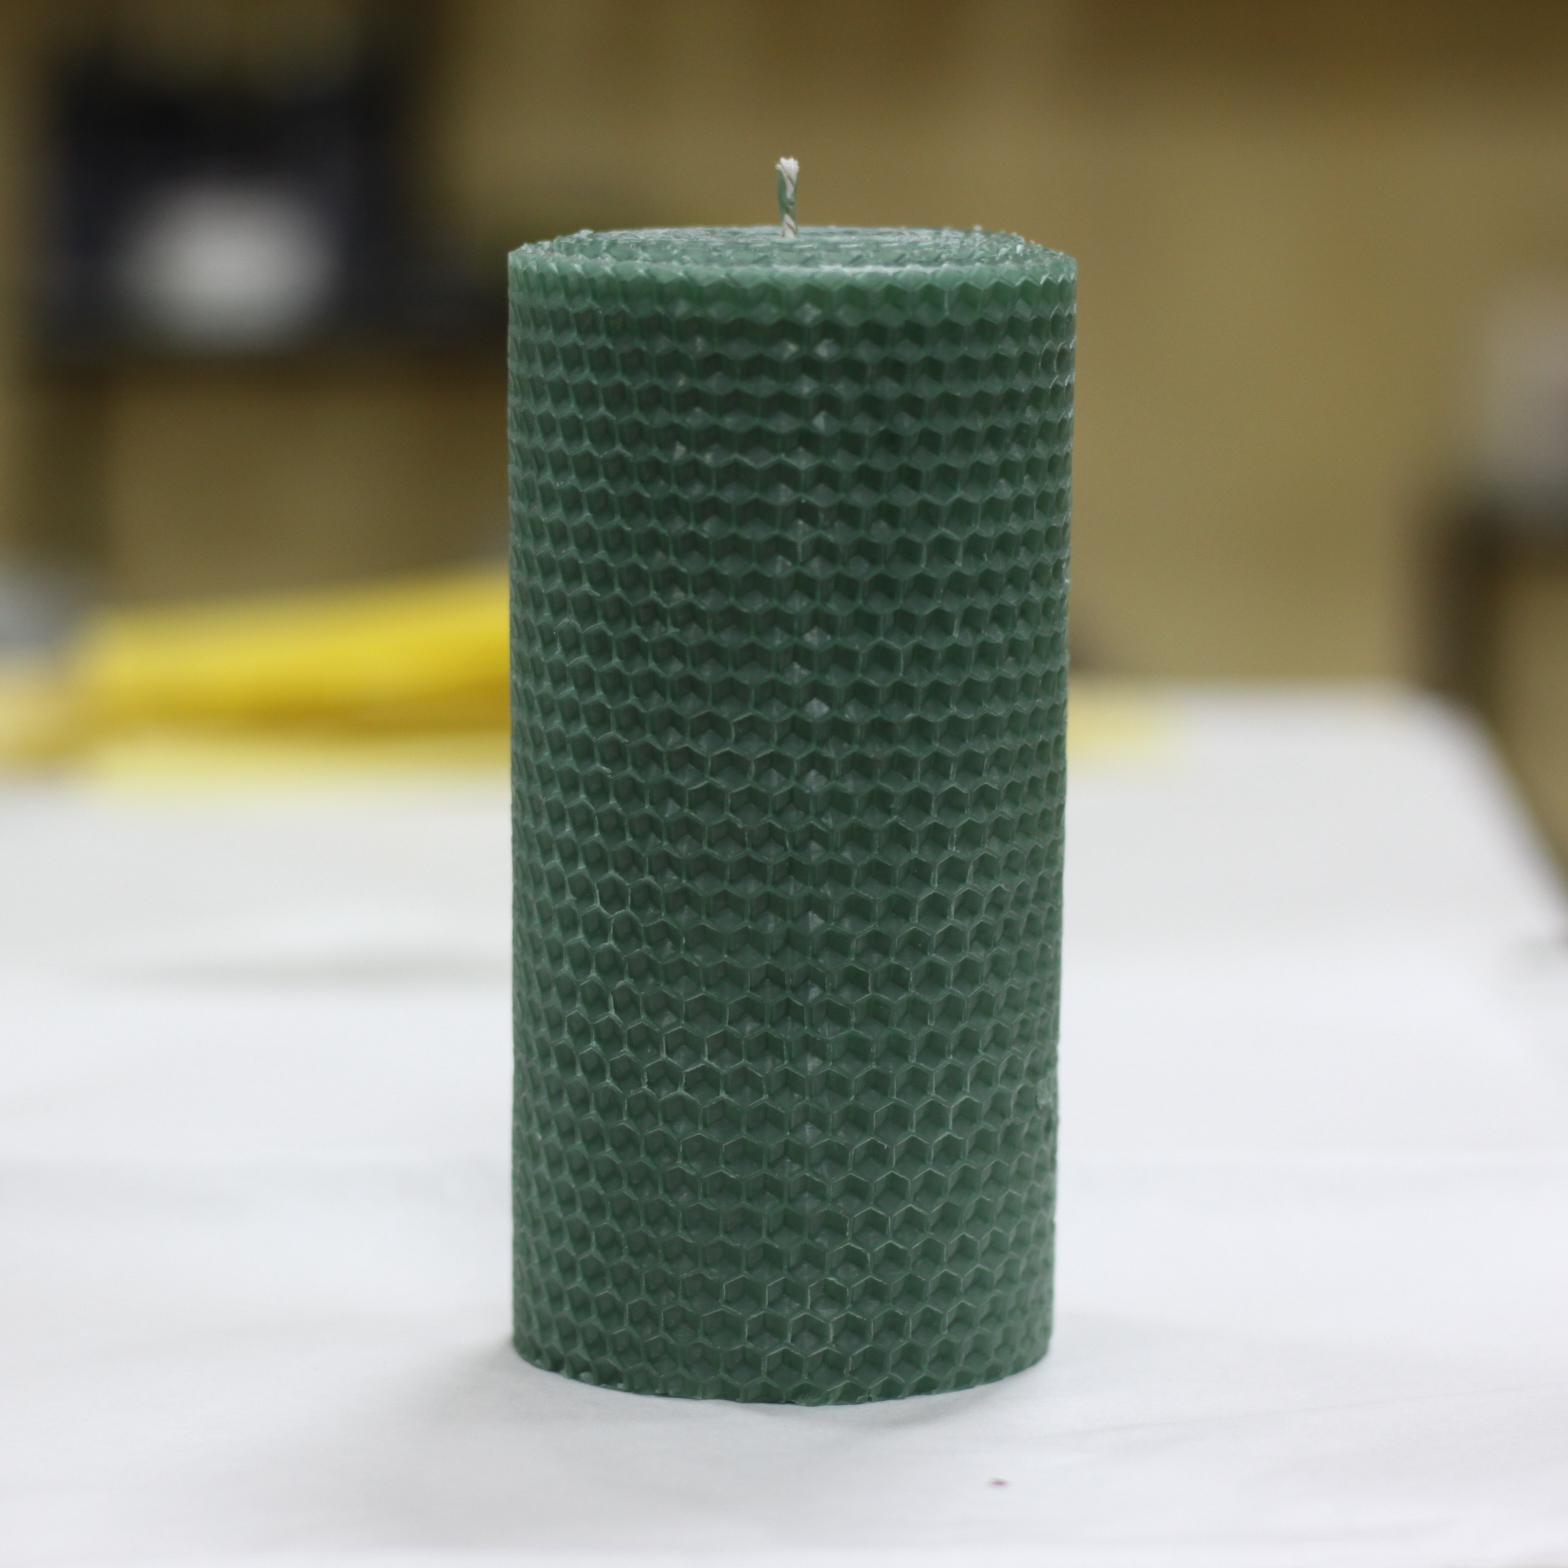 100% Wholesale Handmade Natural Bees Wax Beeswax Pilar